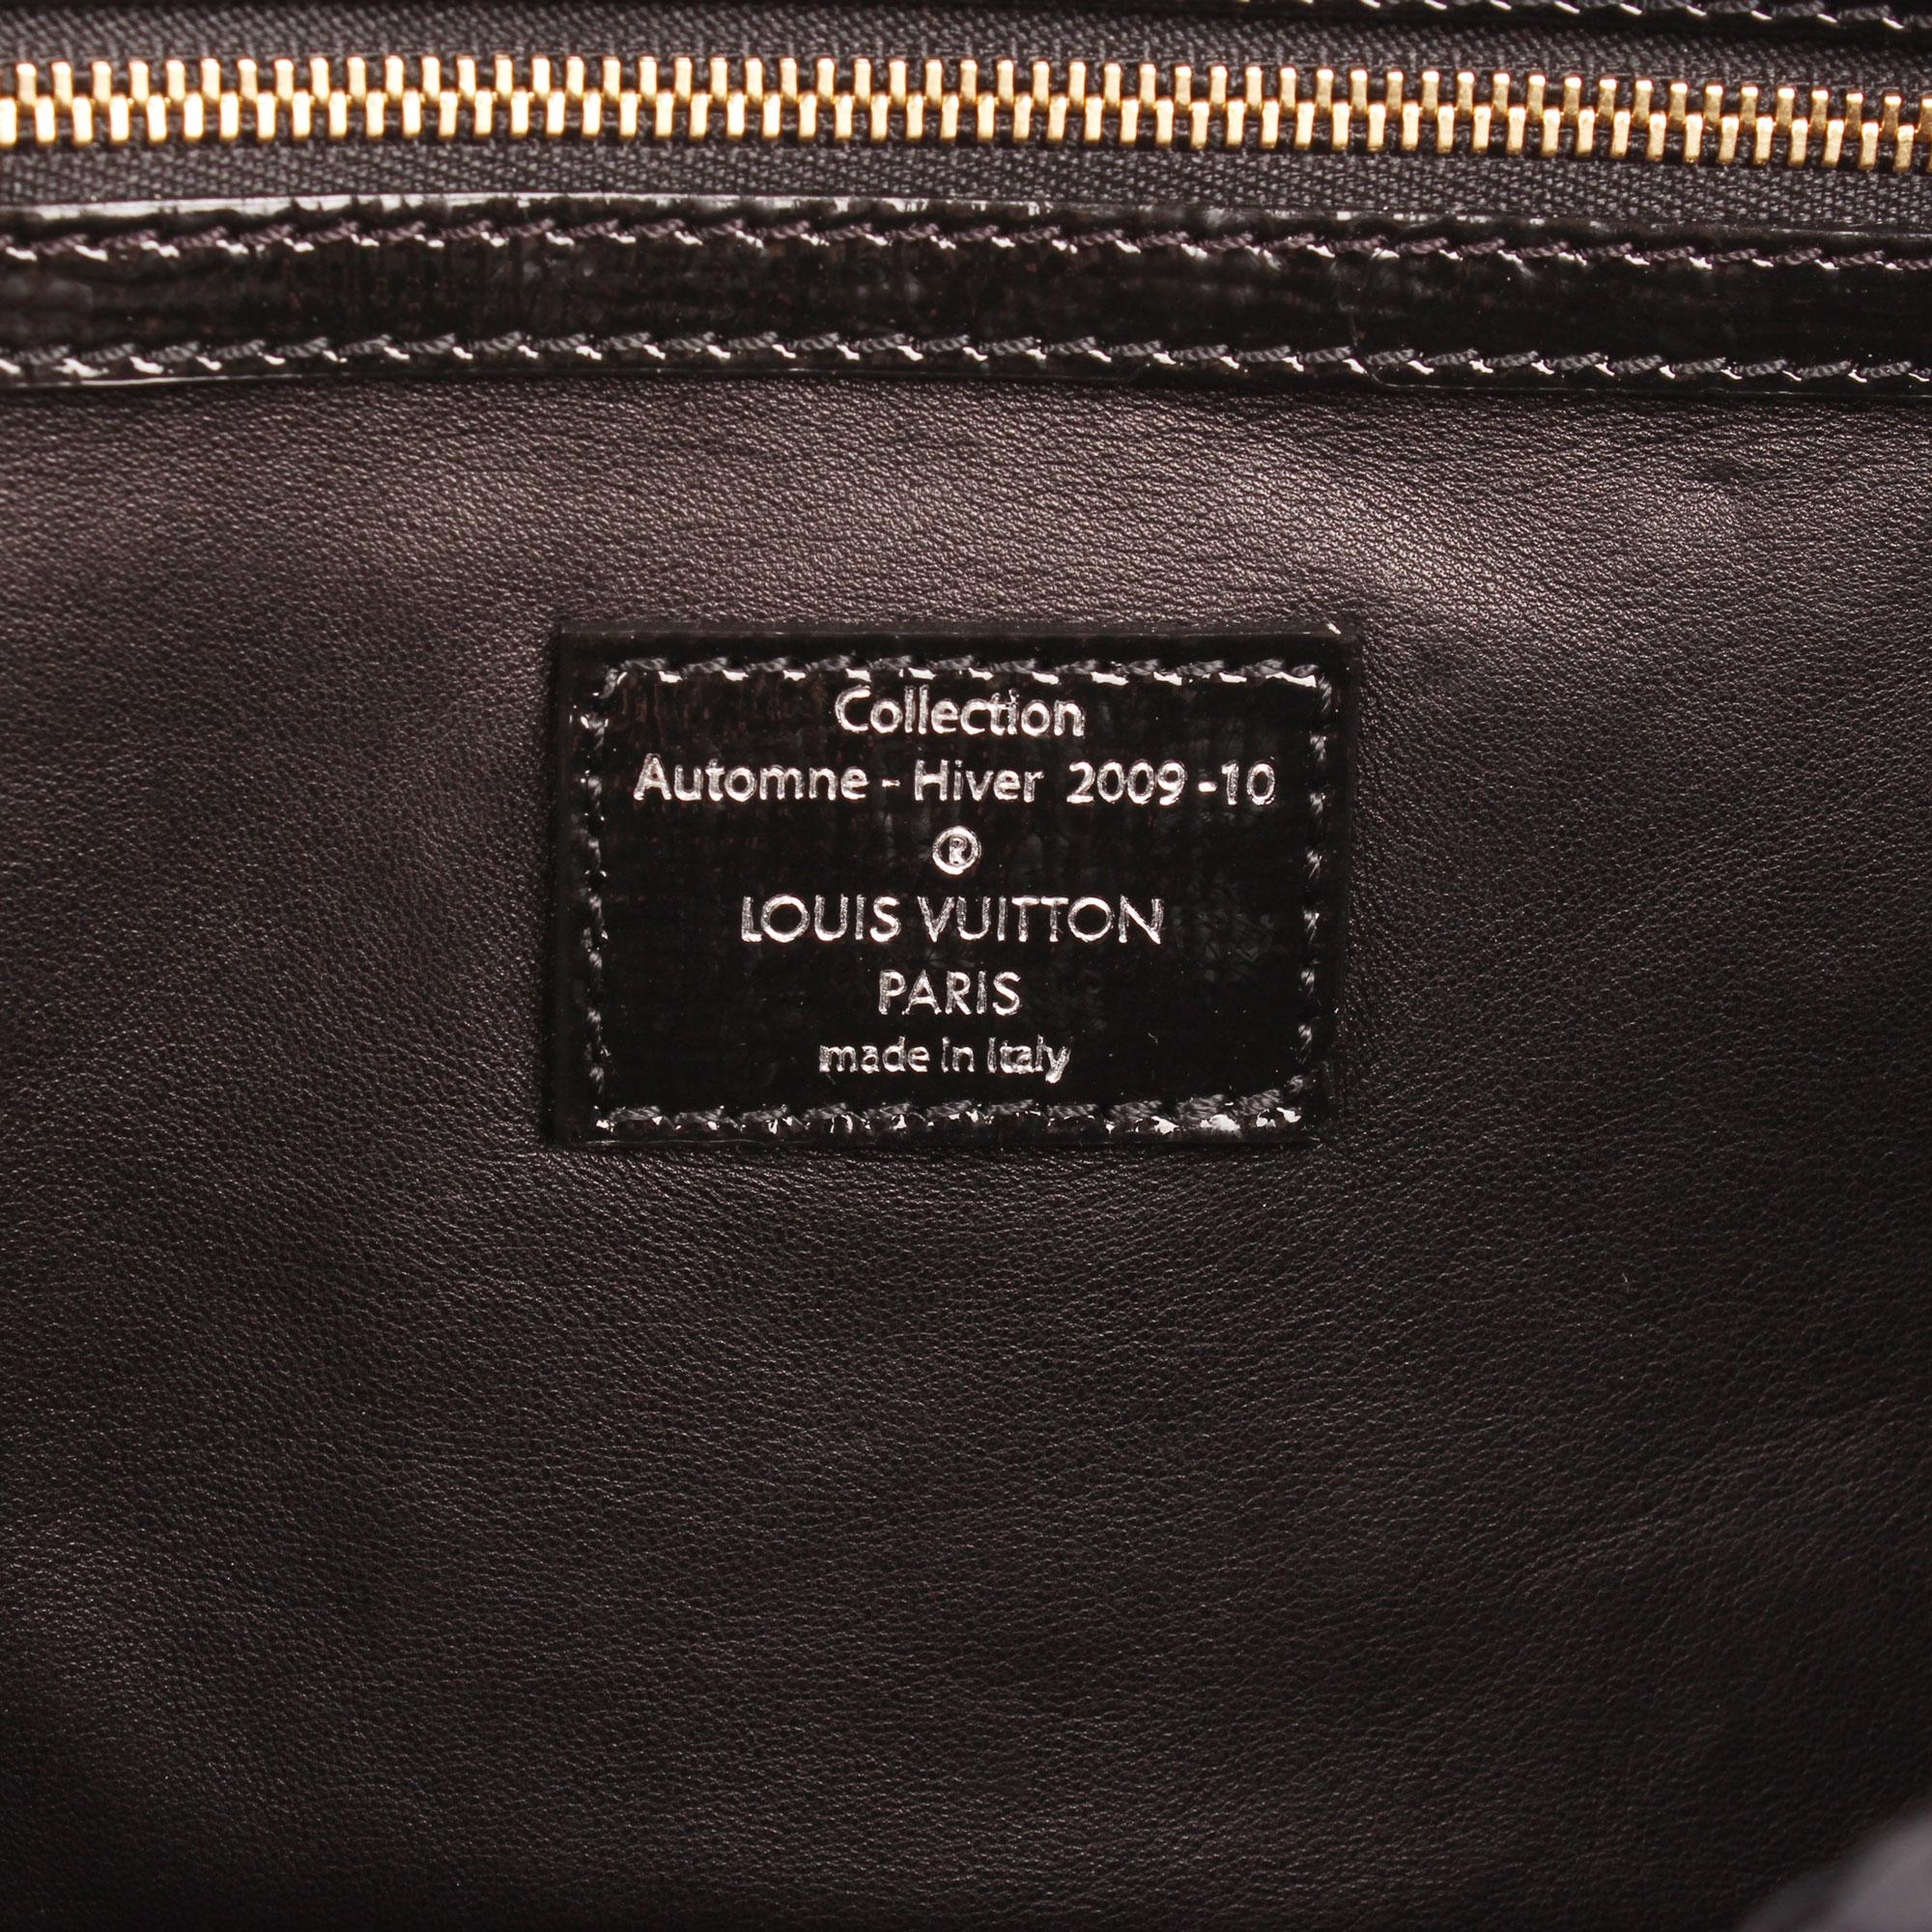 Imagen de la etiqueta interior del louis vuitton coquette clutch embossed monogram azul marino tela piel